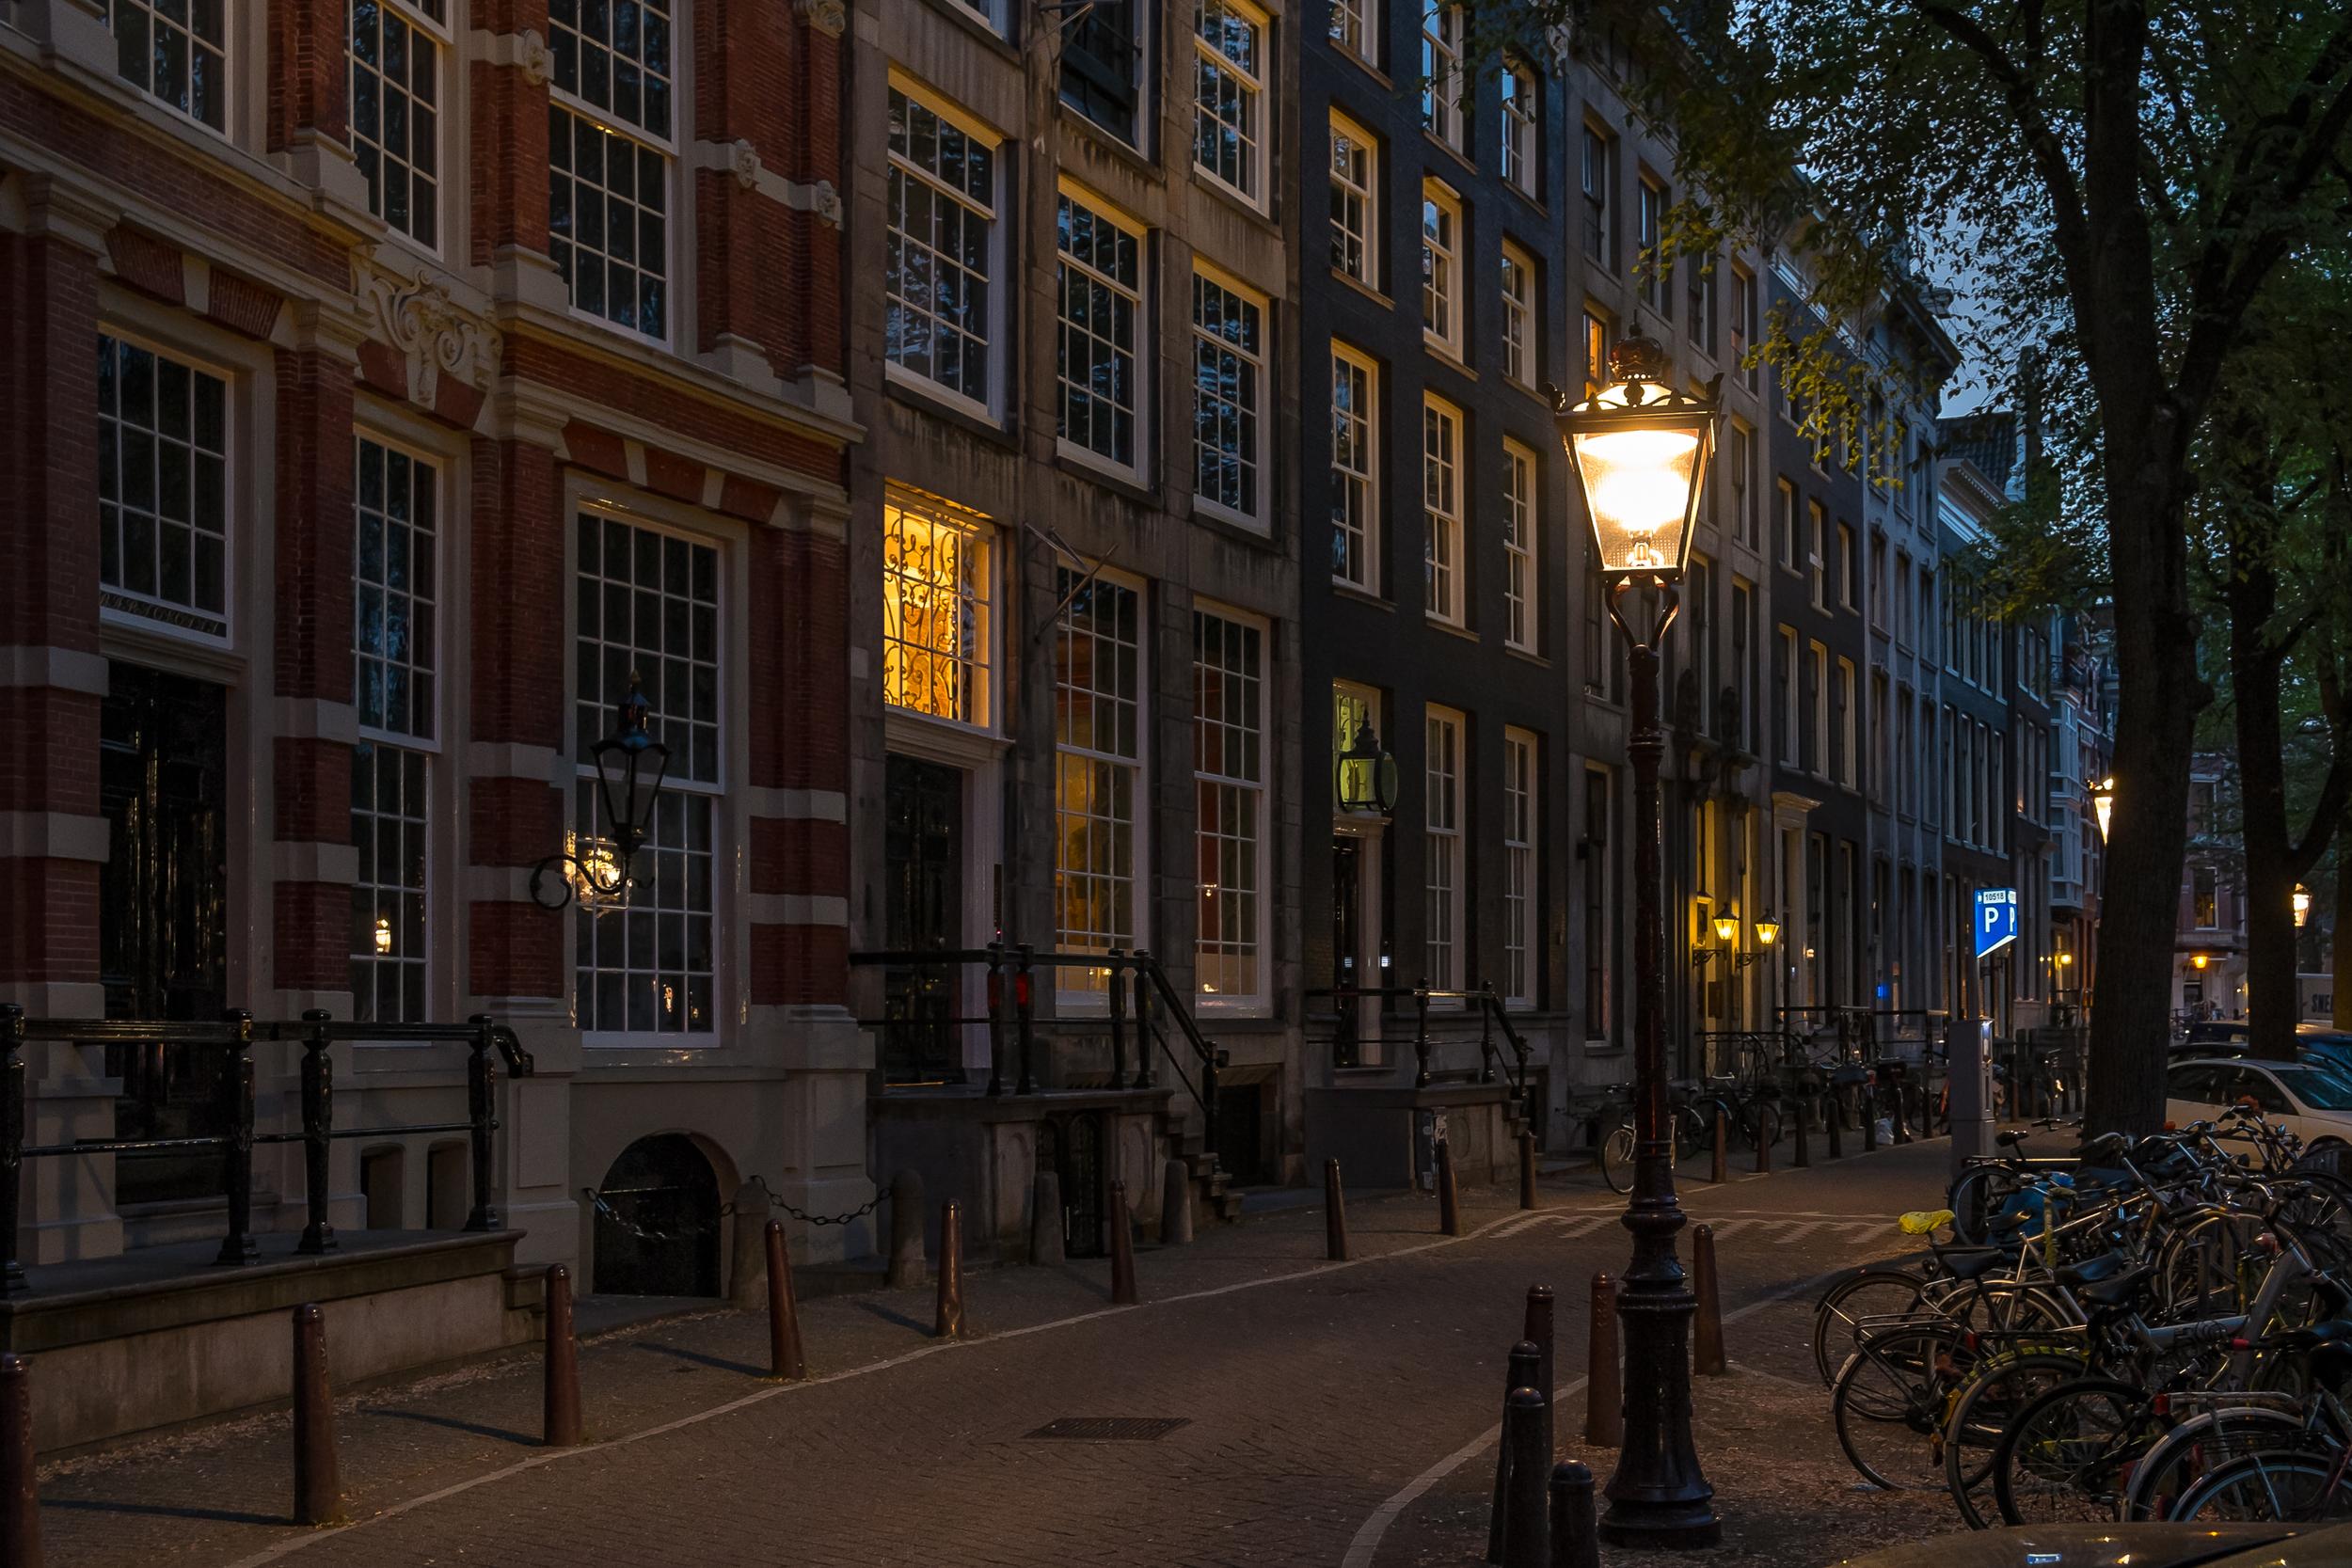 Amsterdam-NightStreet-20130619-DSCF0956.jpg